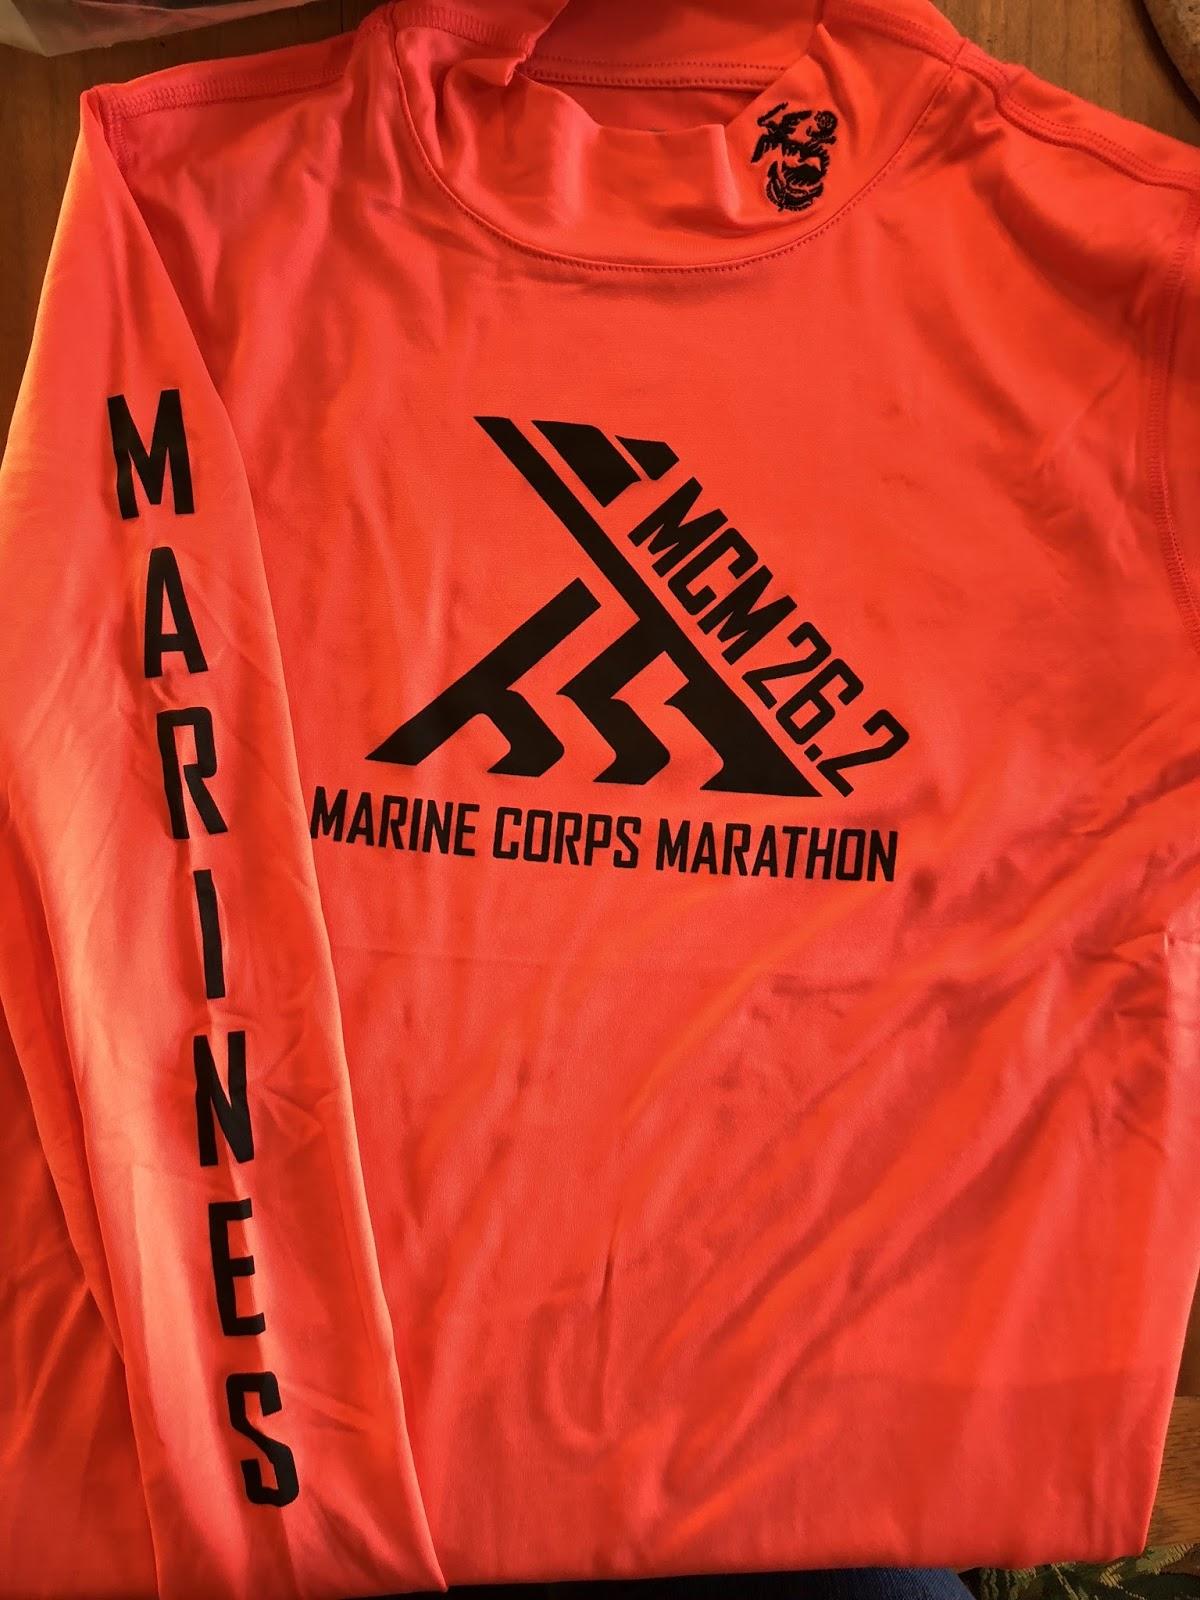 The thrifty runner 2017 marine corps marathon race recap for Marine corps marathon shirt 2017